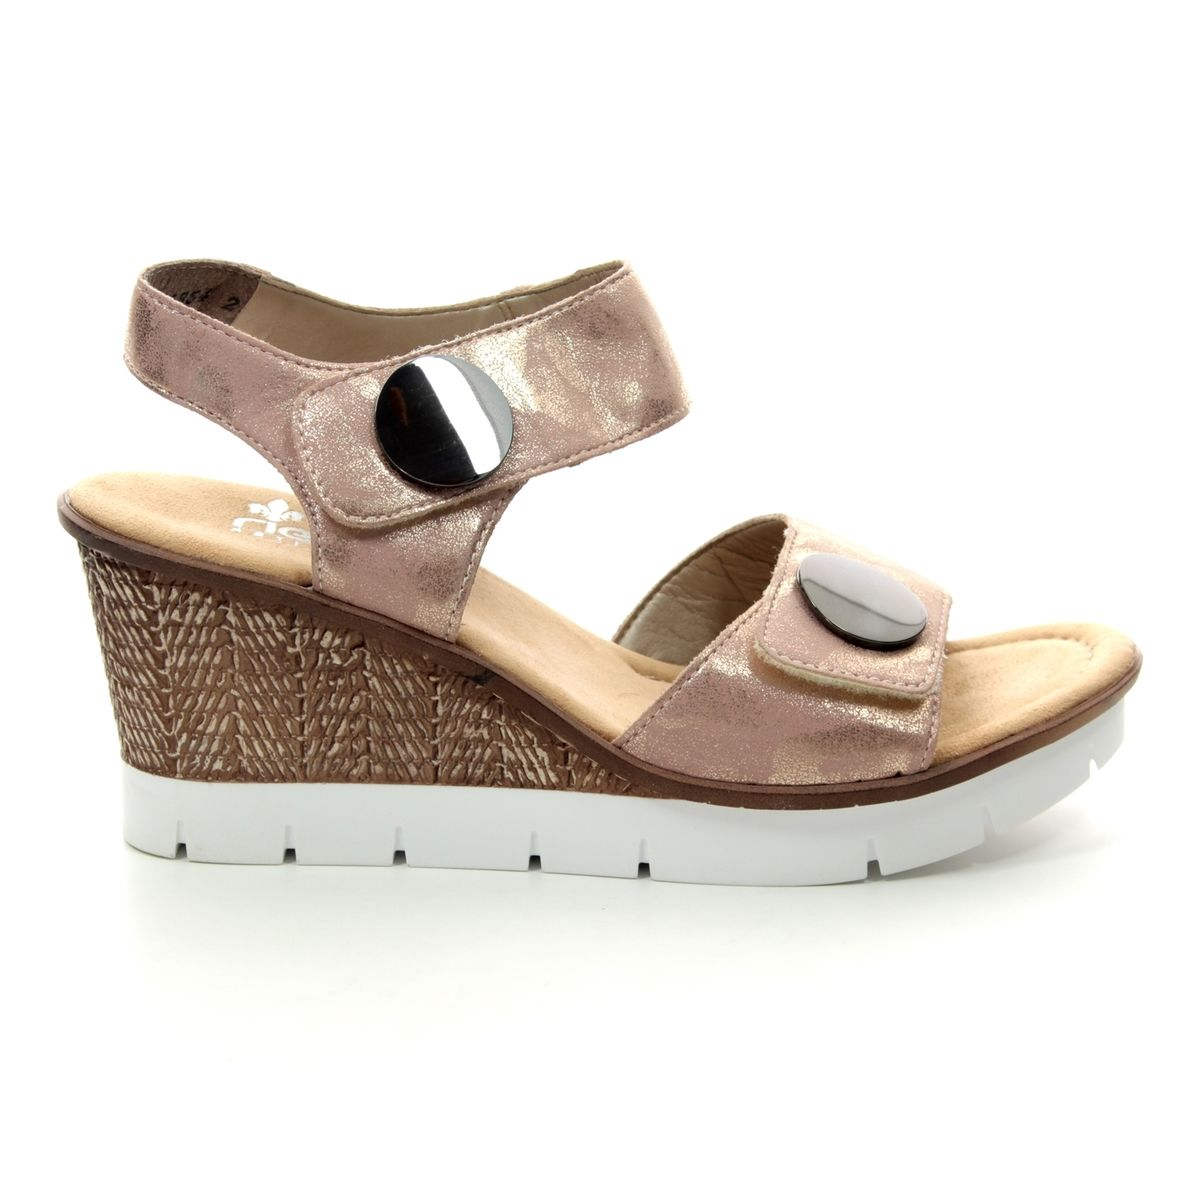 d59e48fcffd1 Rieker Wedge Sandals - ROSE - 65569-31 ALTON